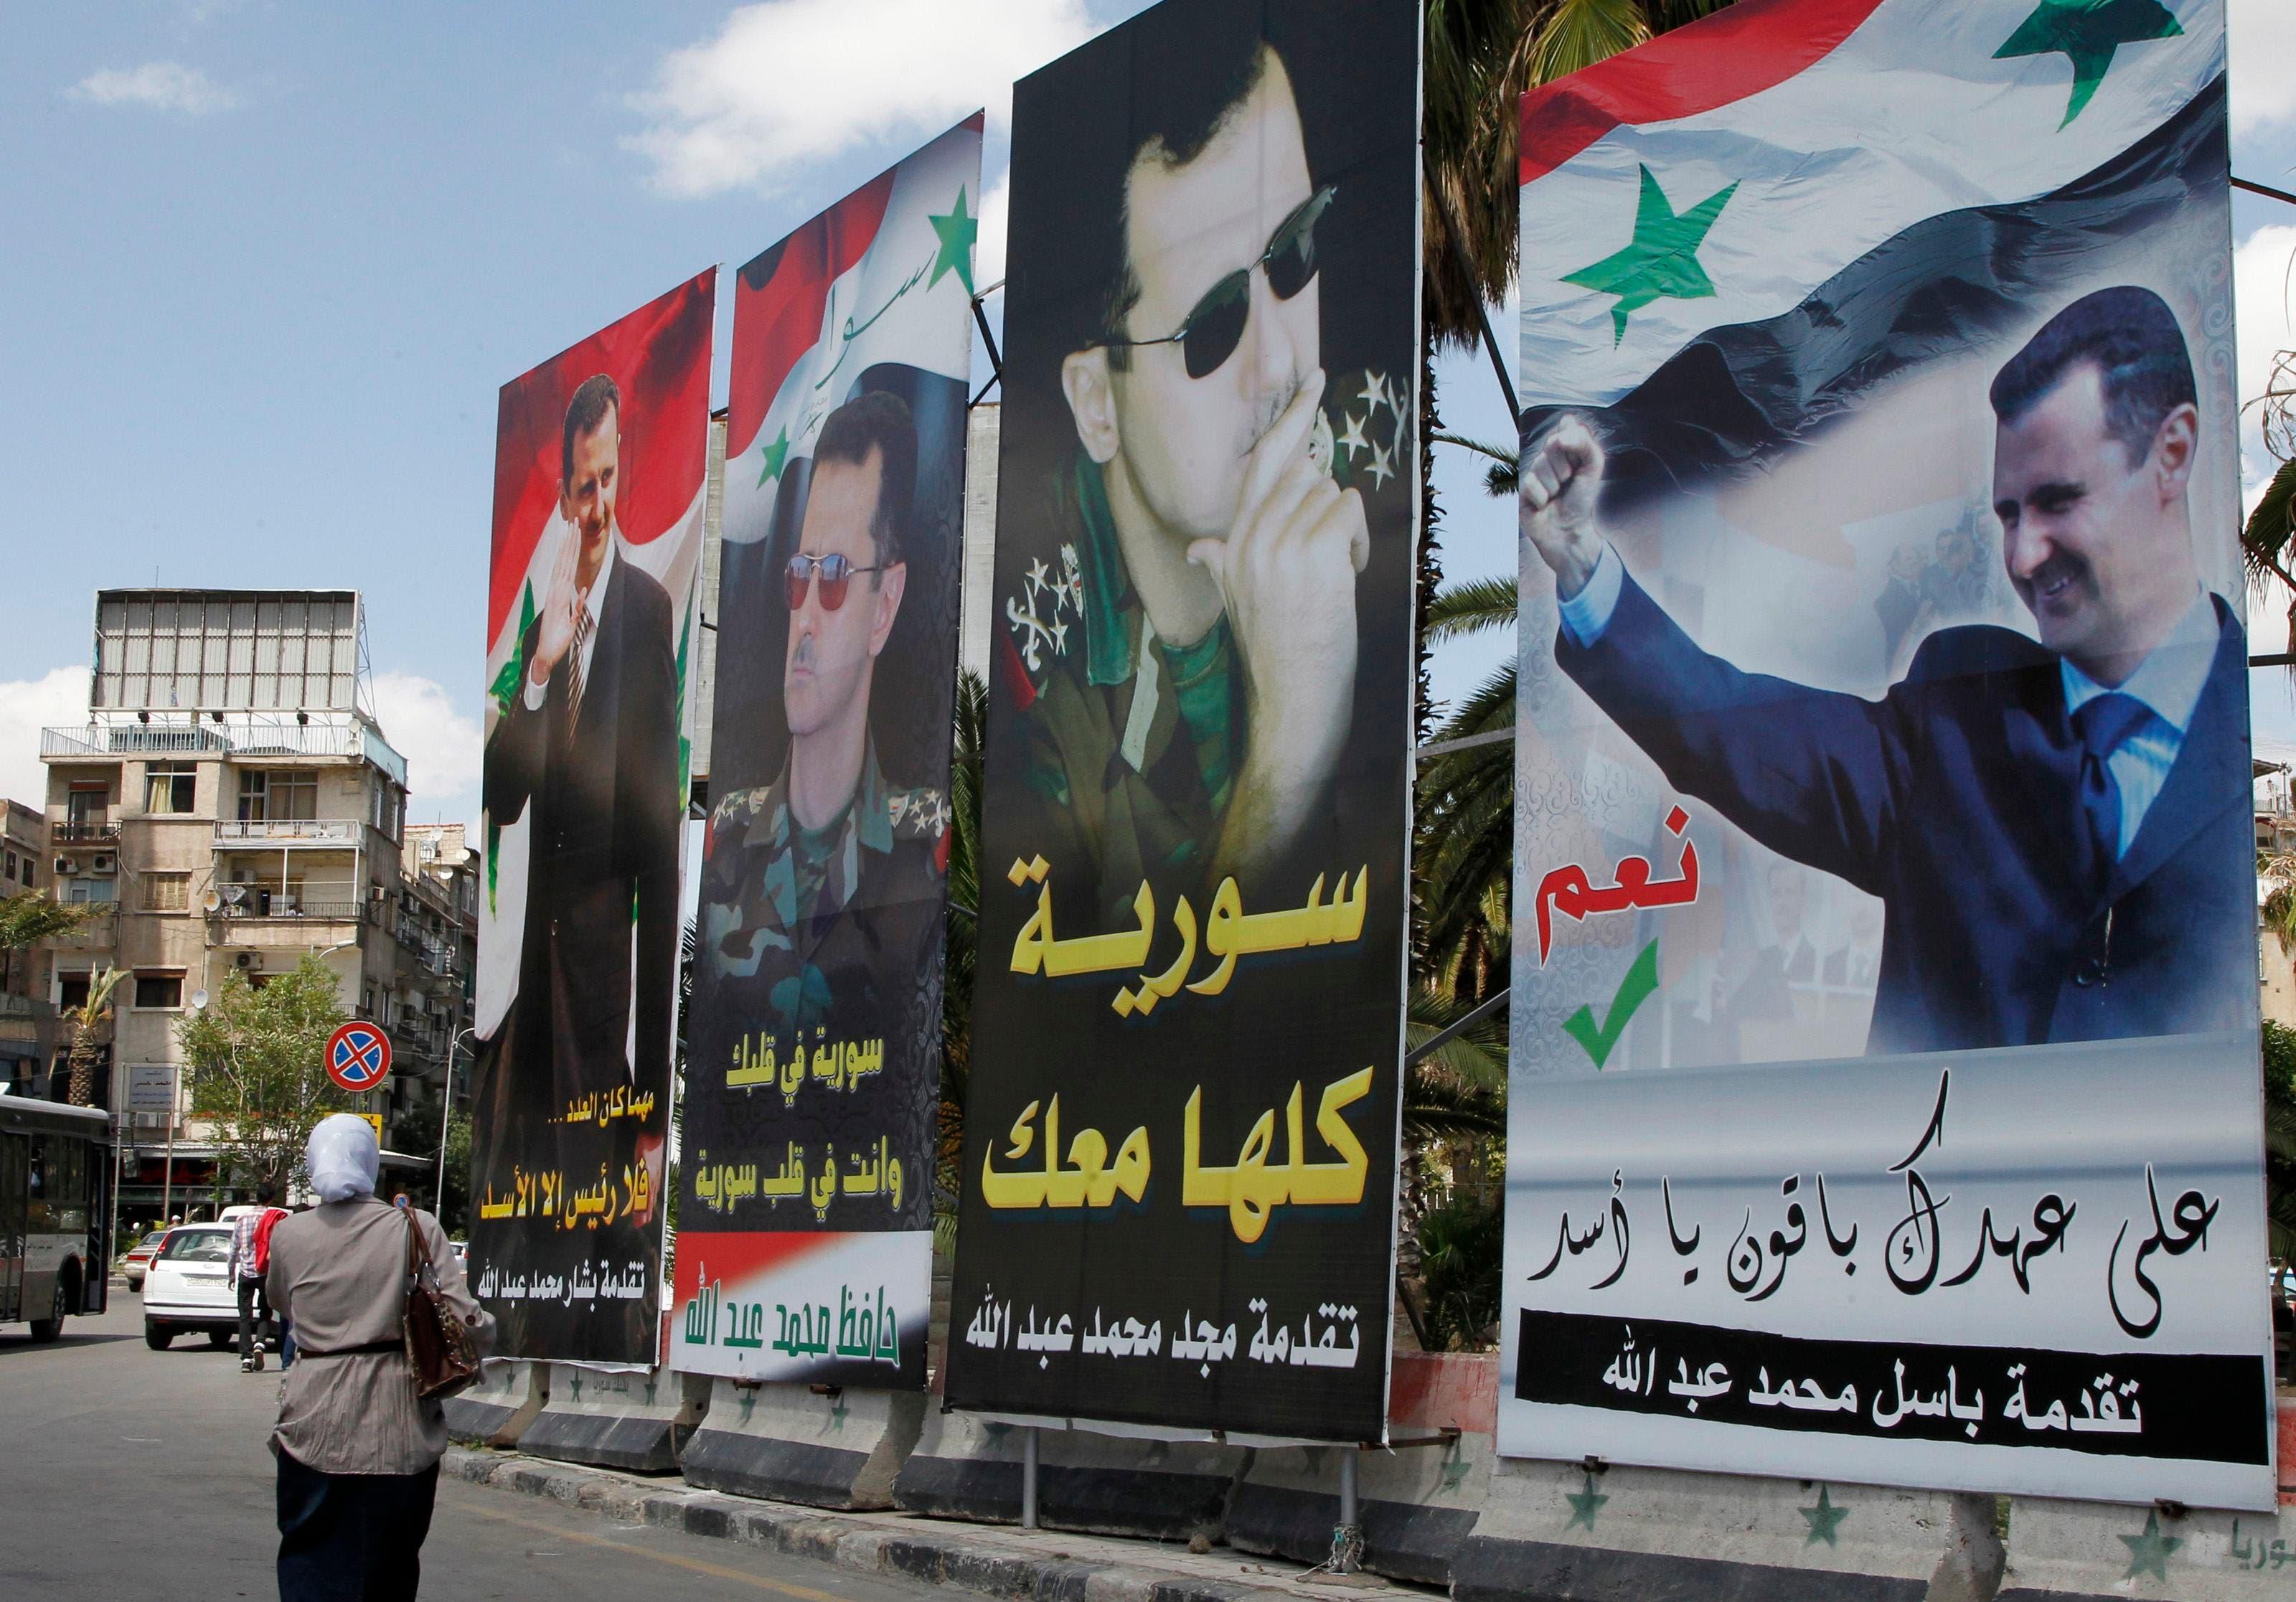 انتخابات في سوريا (فرانس برس)